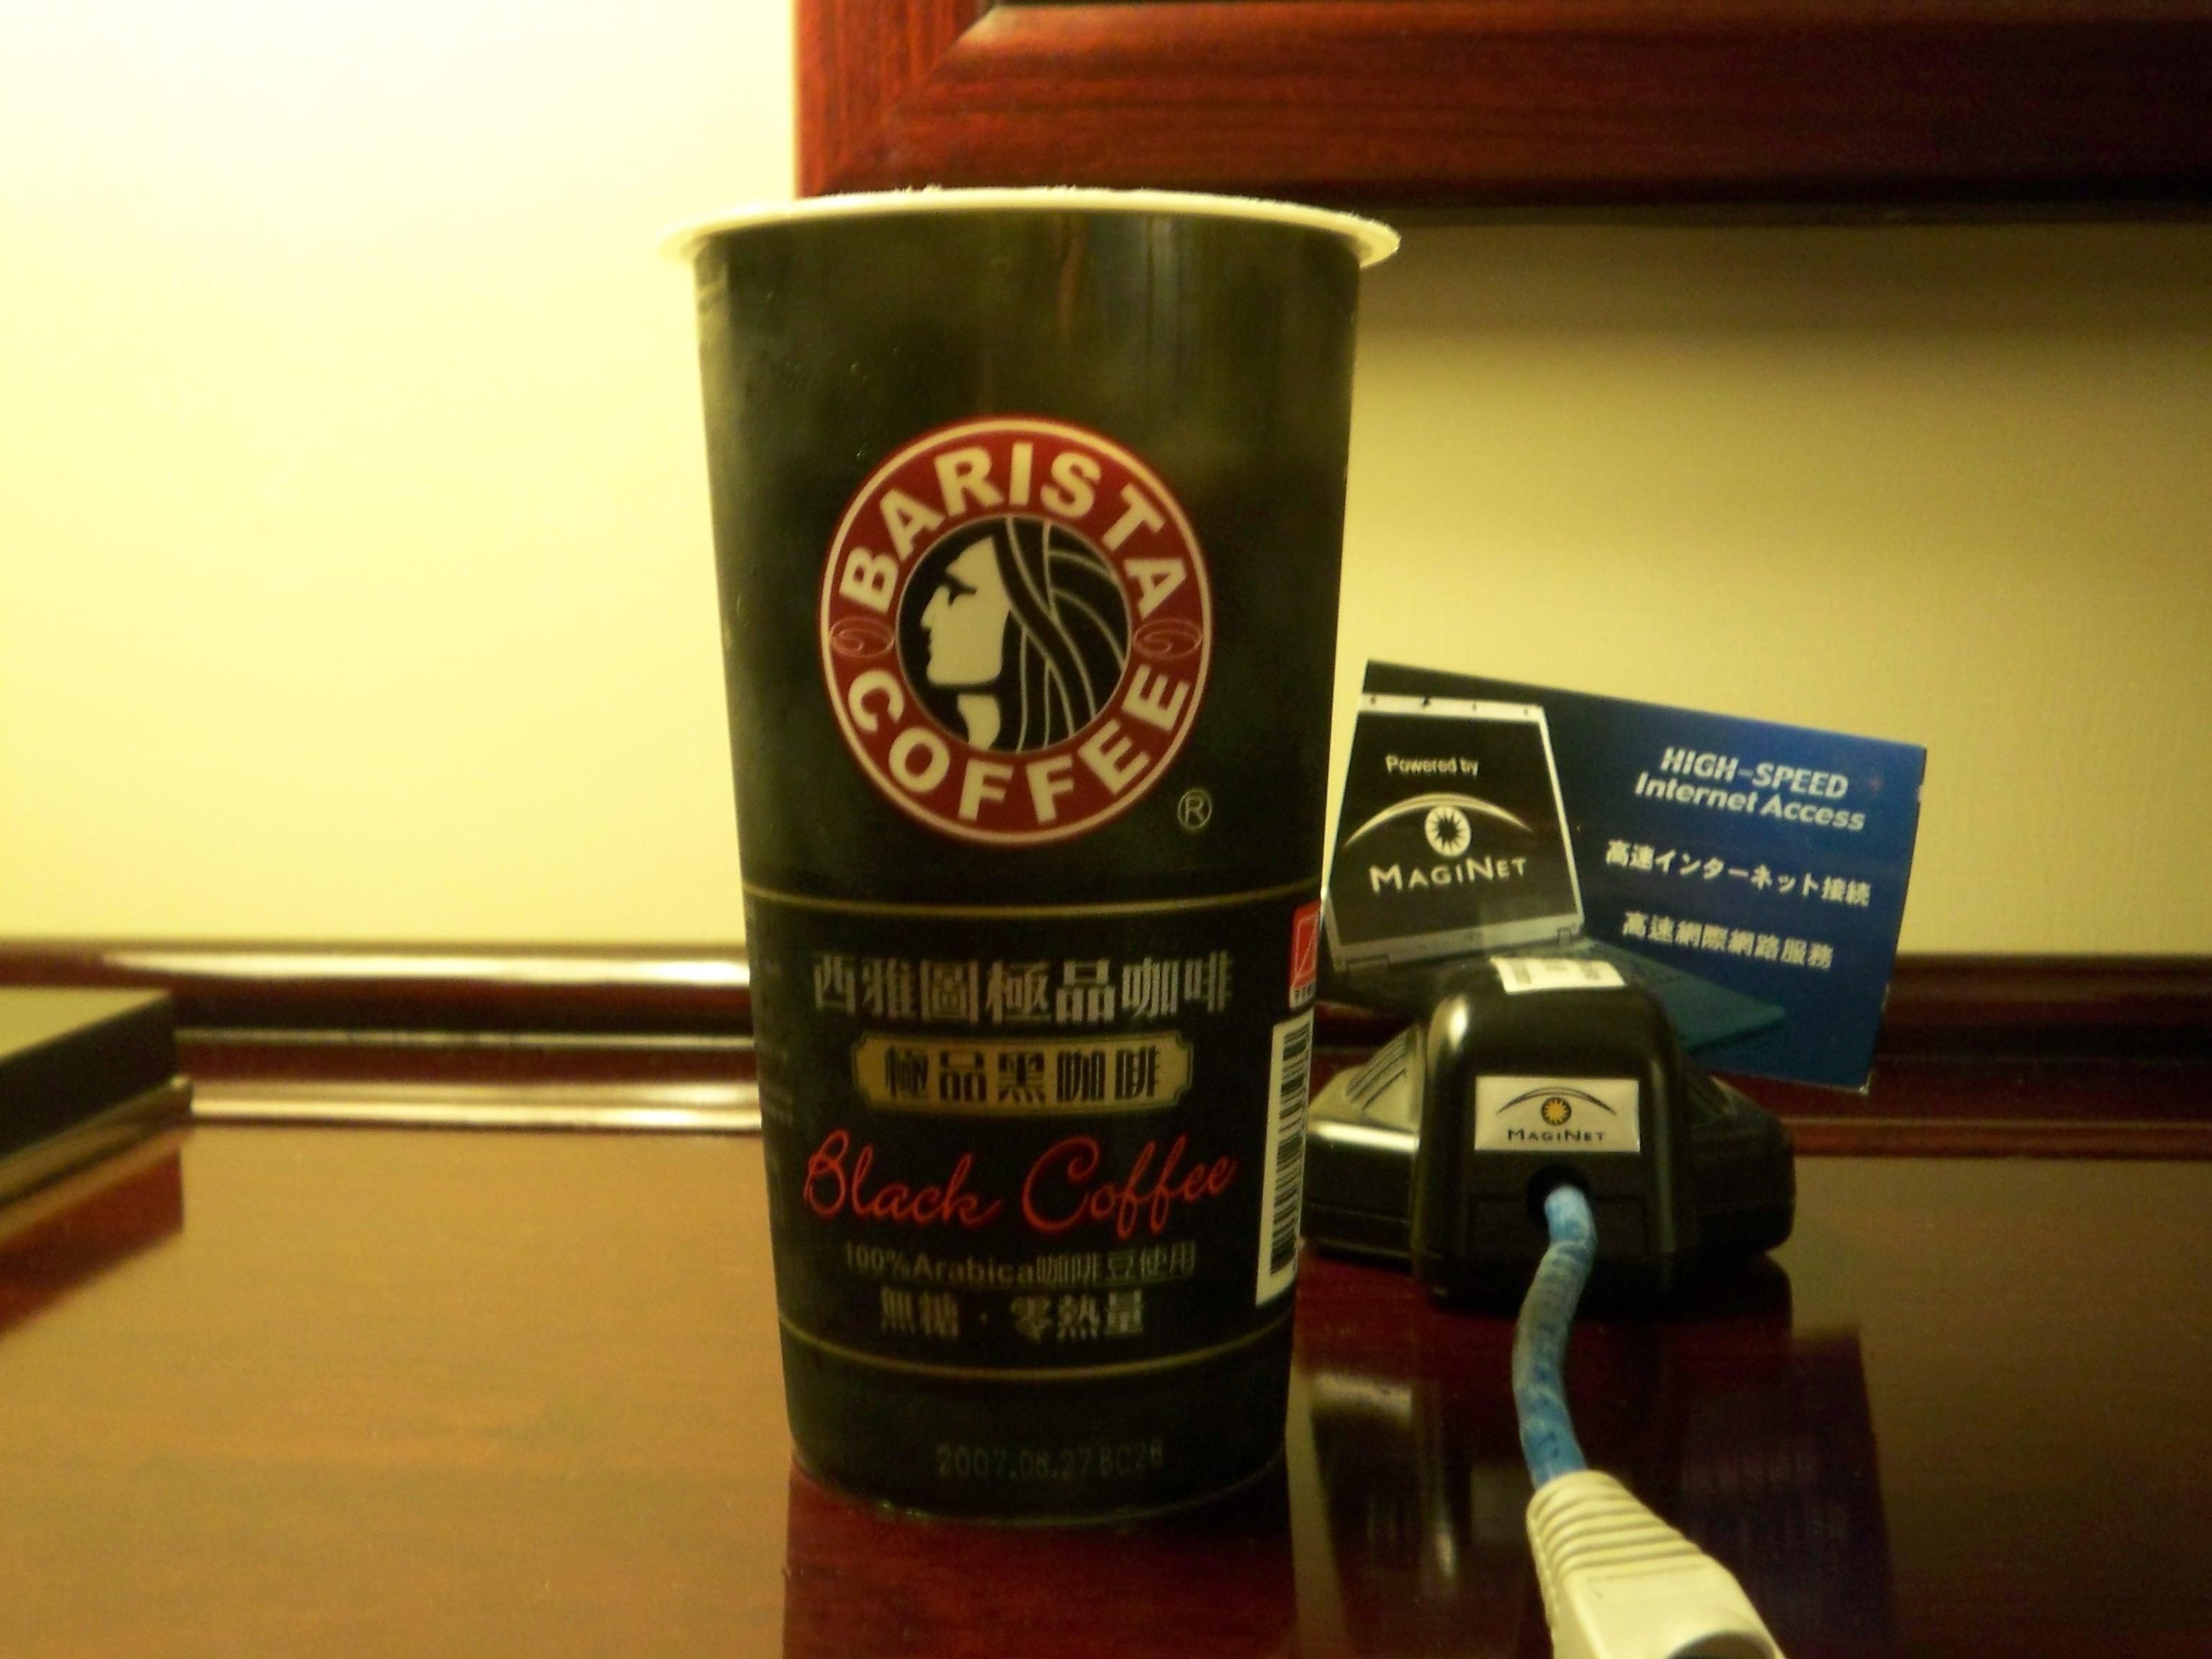 Barista coffee india - Costa coffee head office telephone number ...